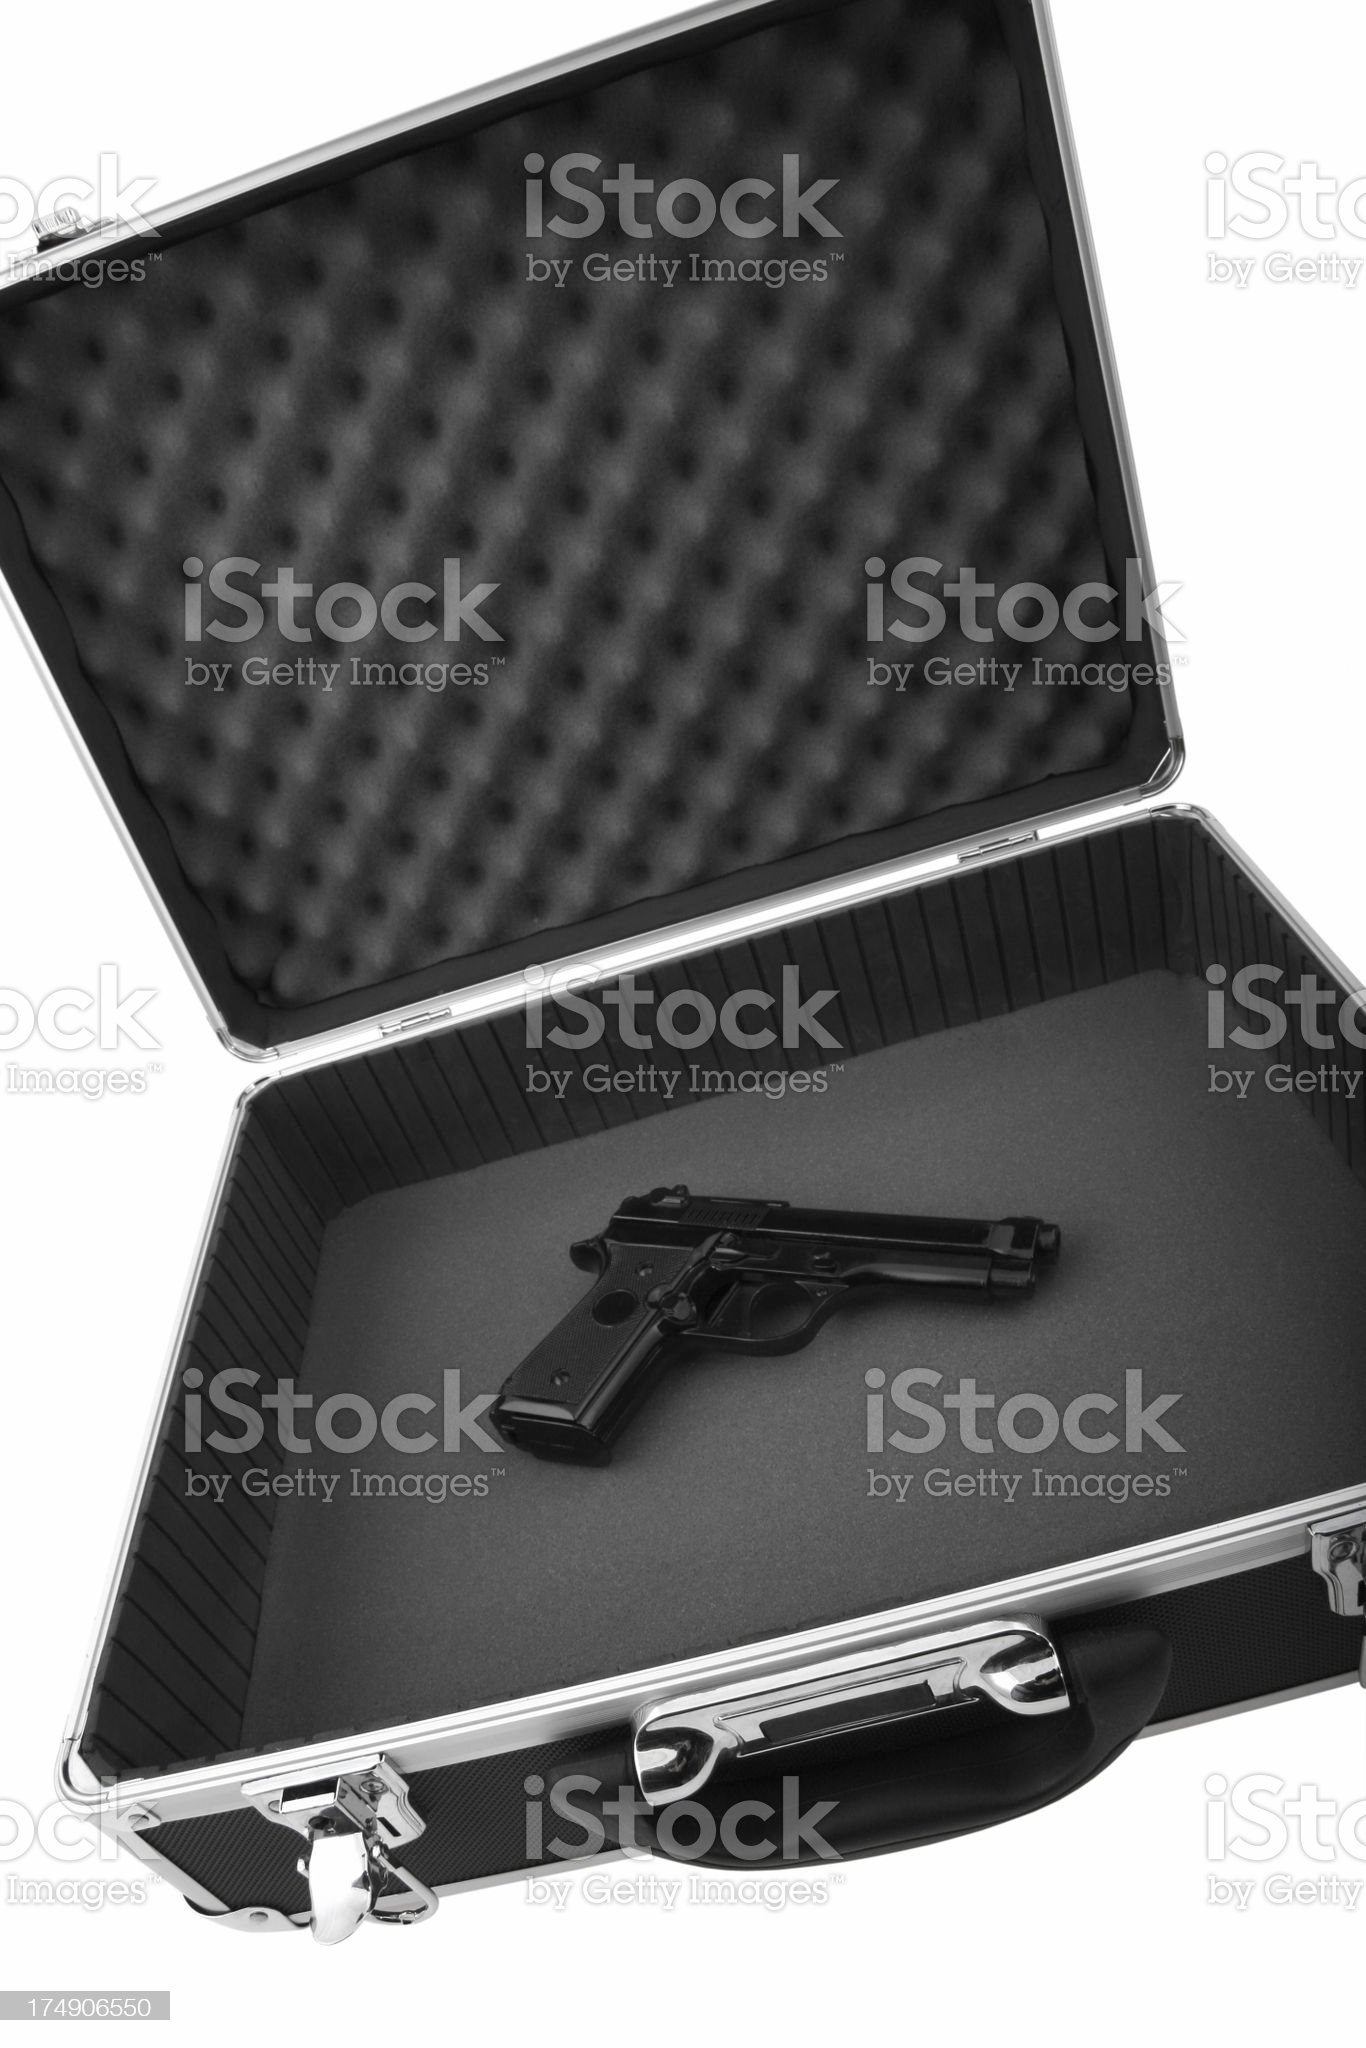 Hitman'€™s Weapon royalty-free stock photo